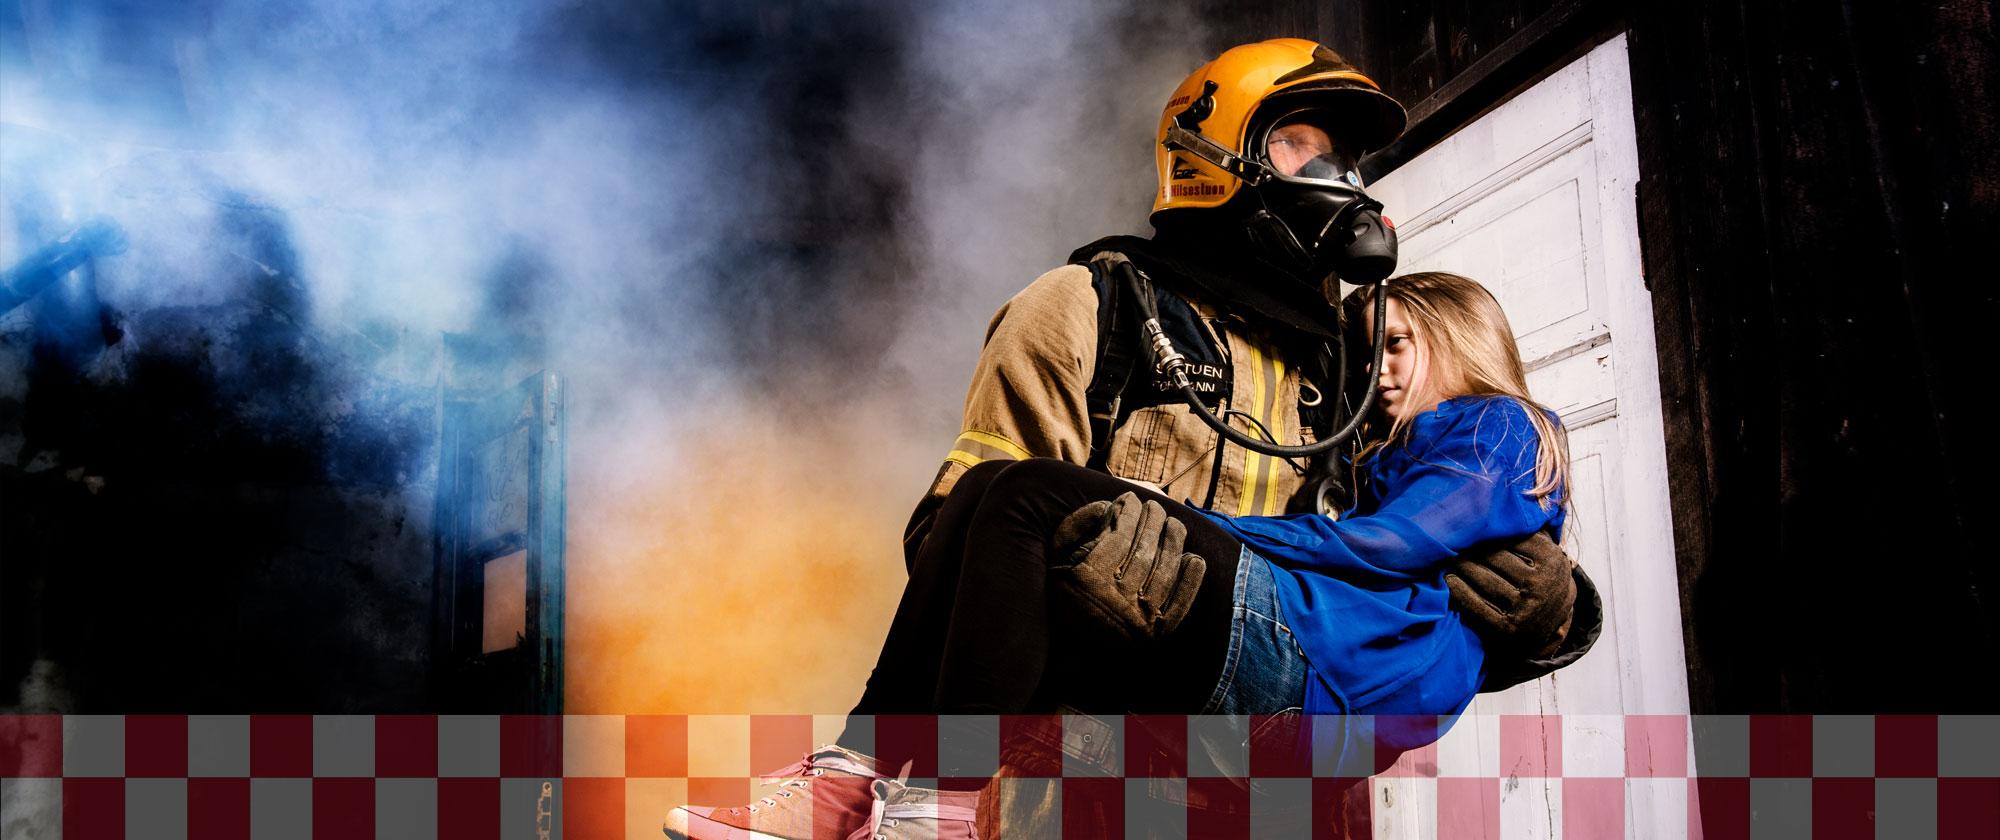 Brannvesen - redning